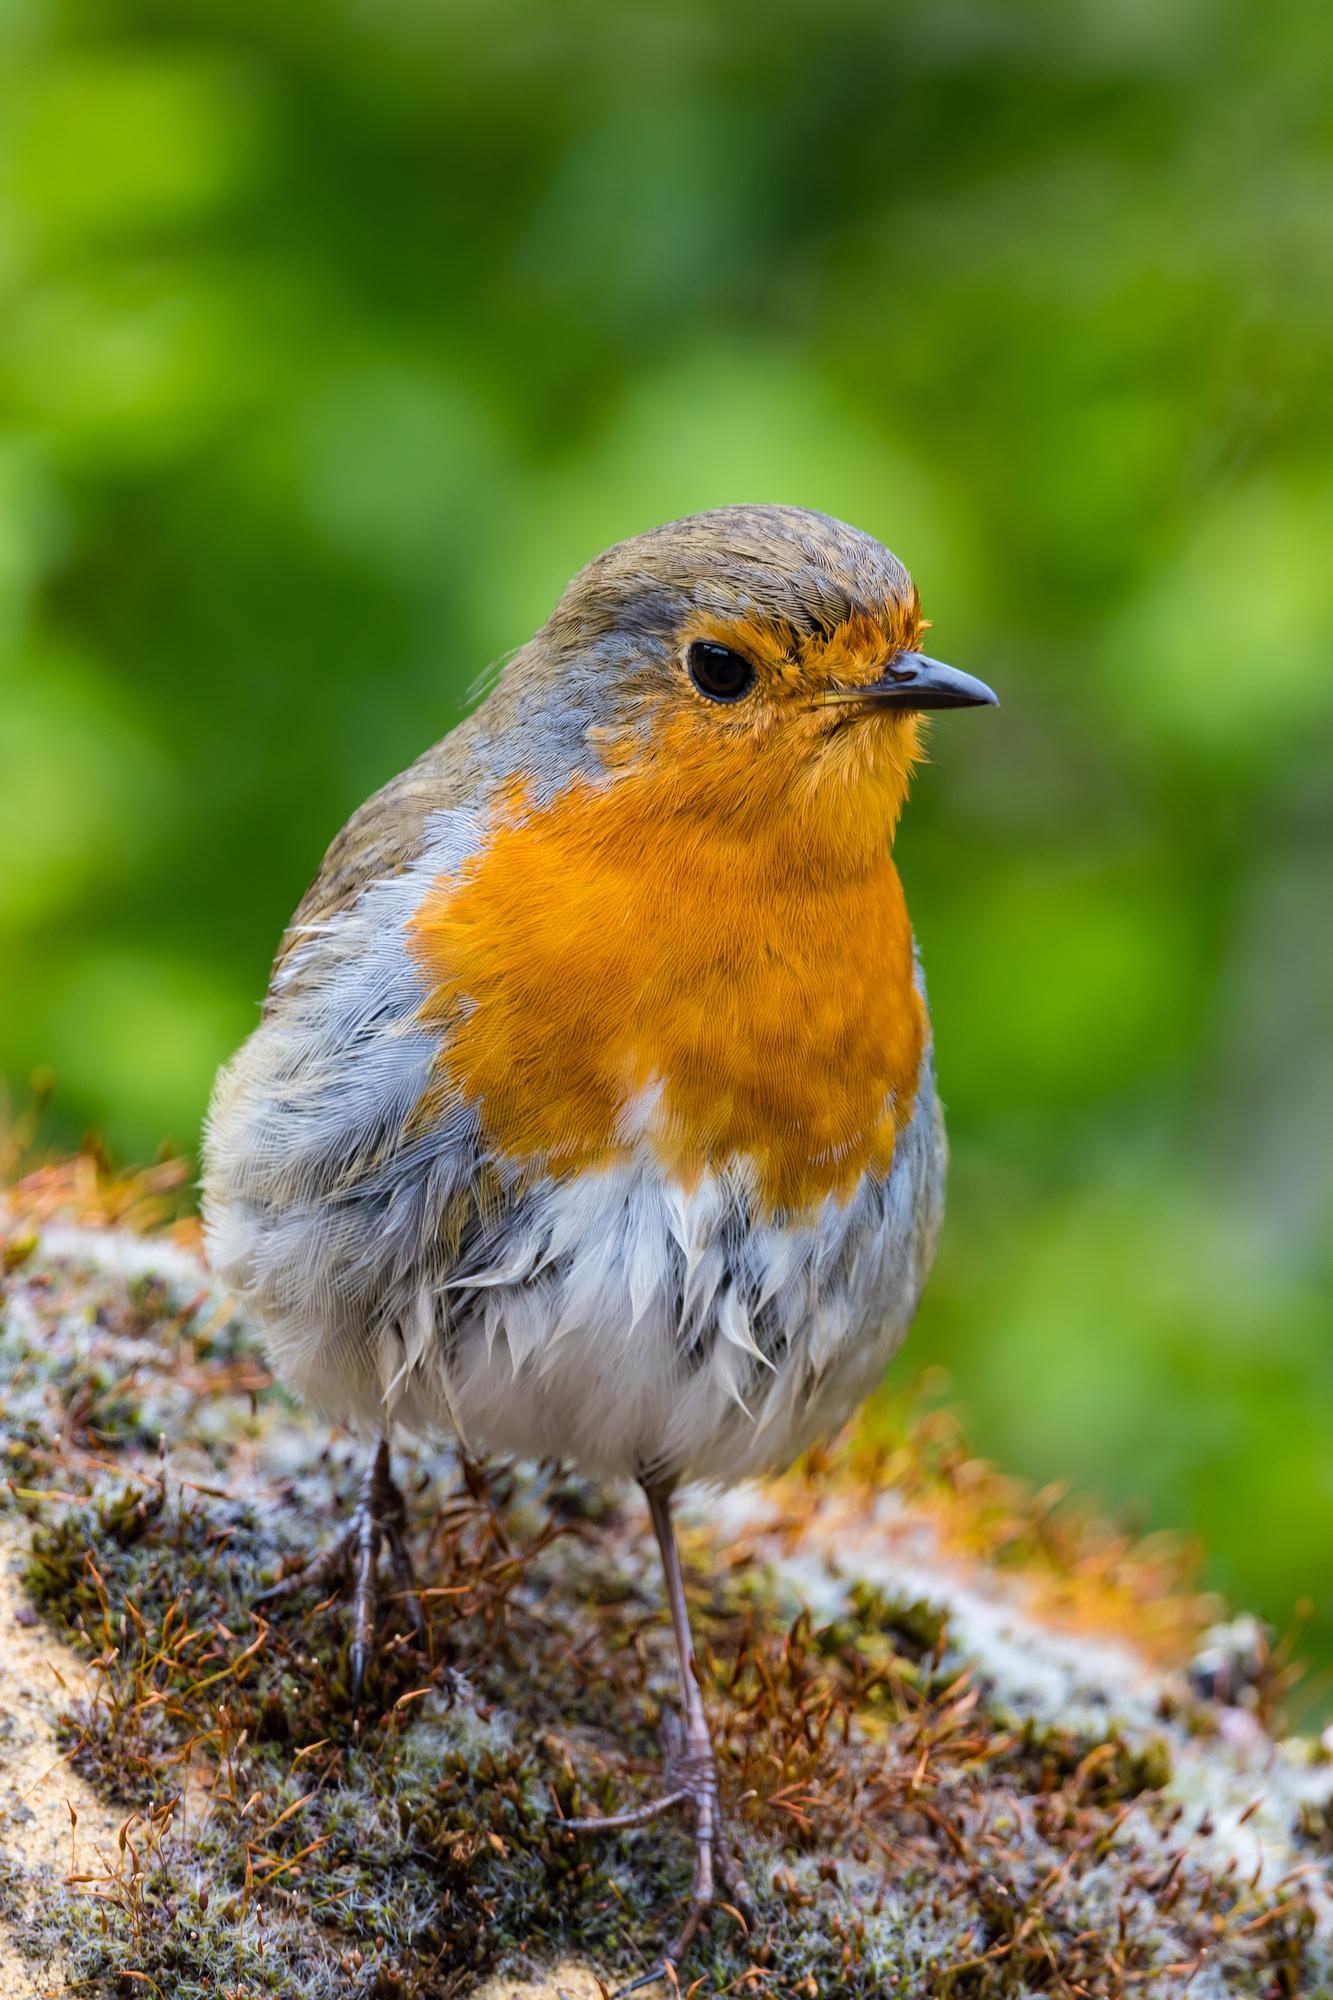 (538) European Robin, Robin Redbreast, Erithacus rubecula, Britain's National Bird, Edinburgh, Scotland.jpg